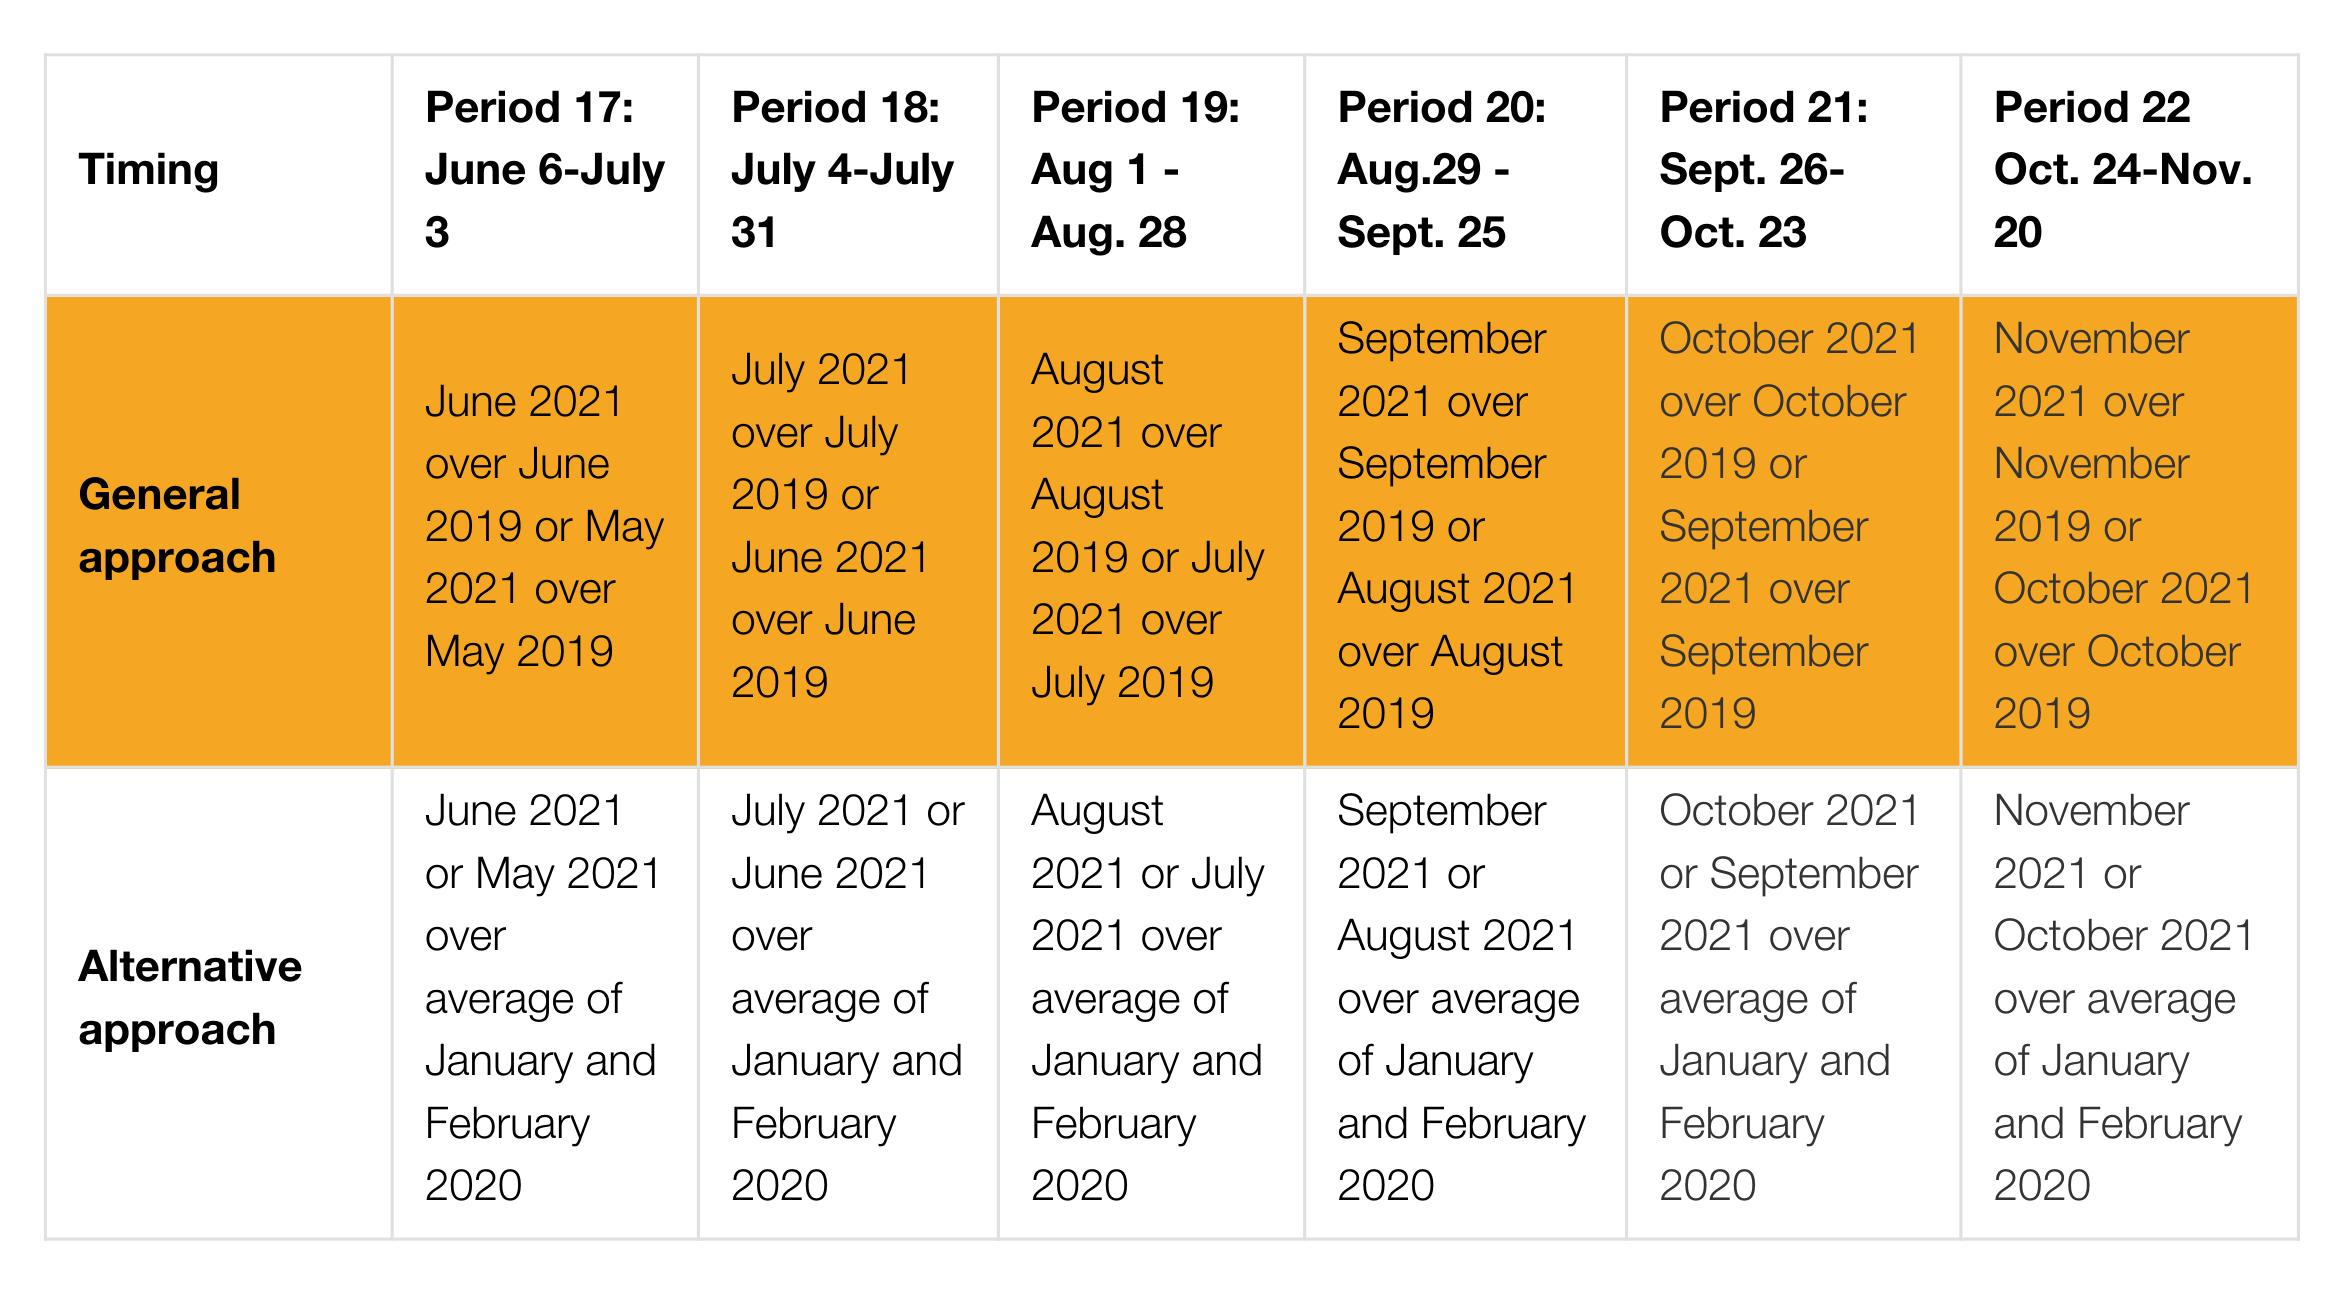 Revenue decline reference periods